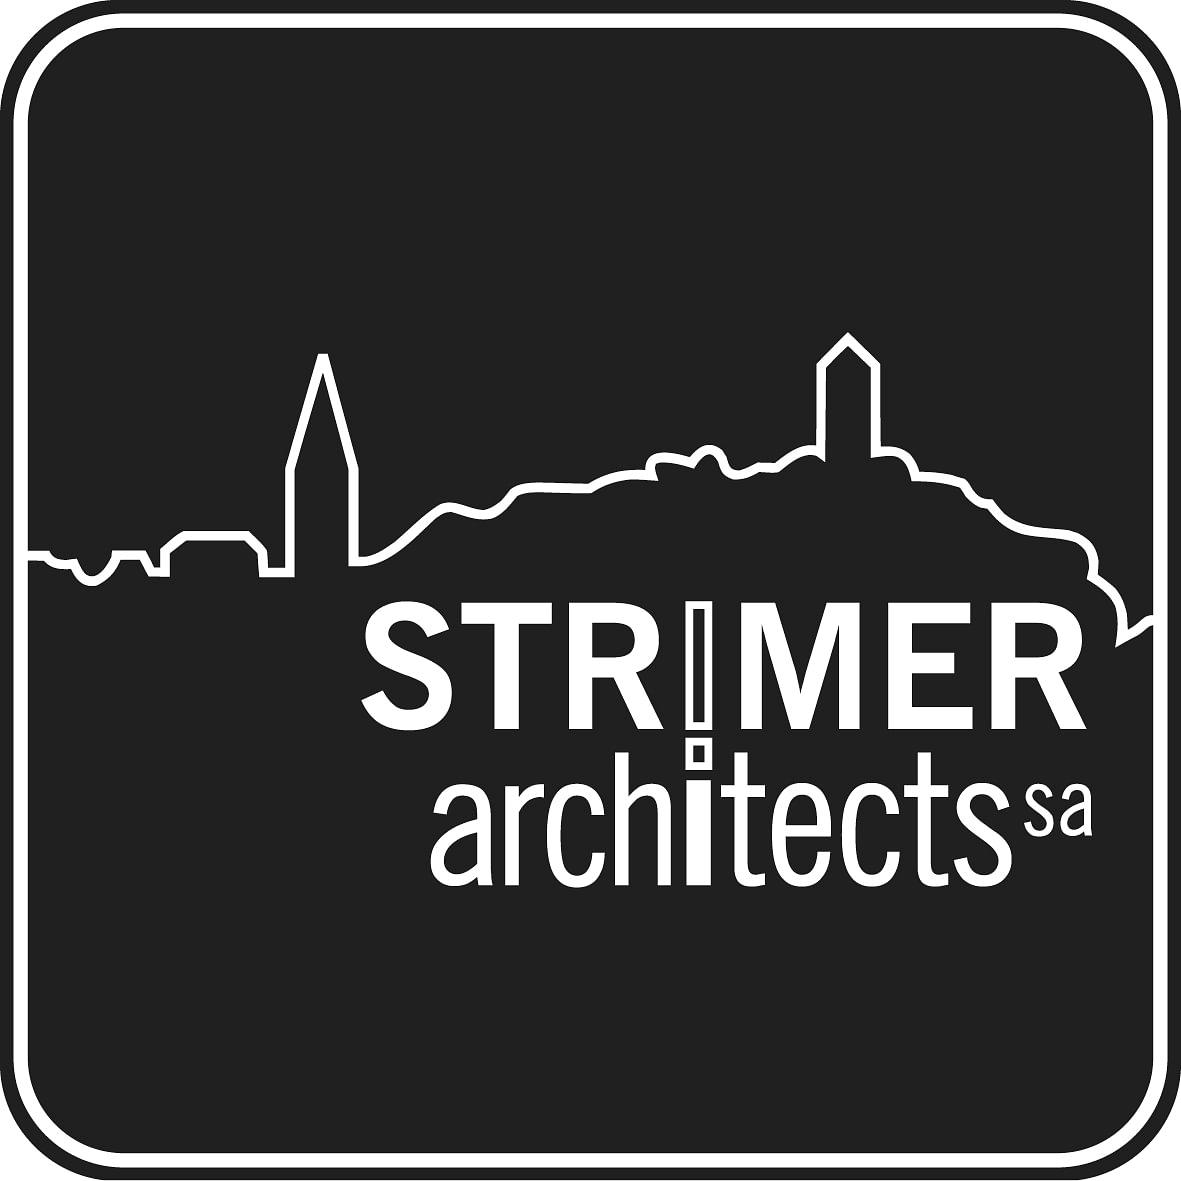 Strimer architects SA